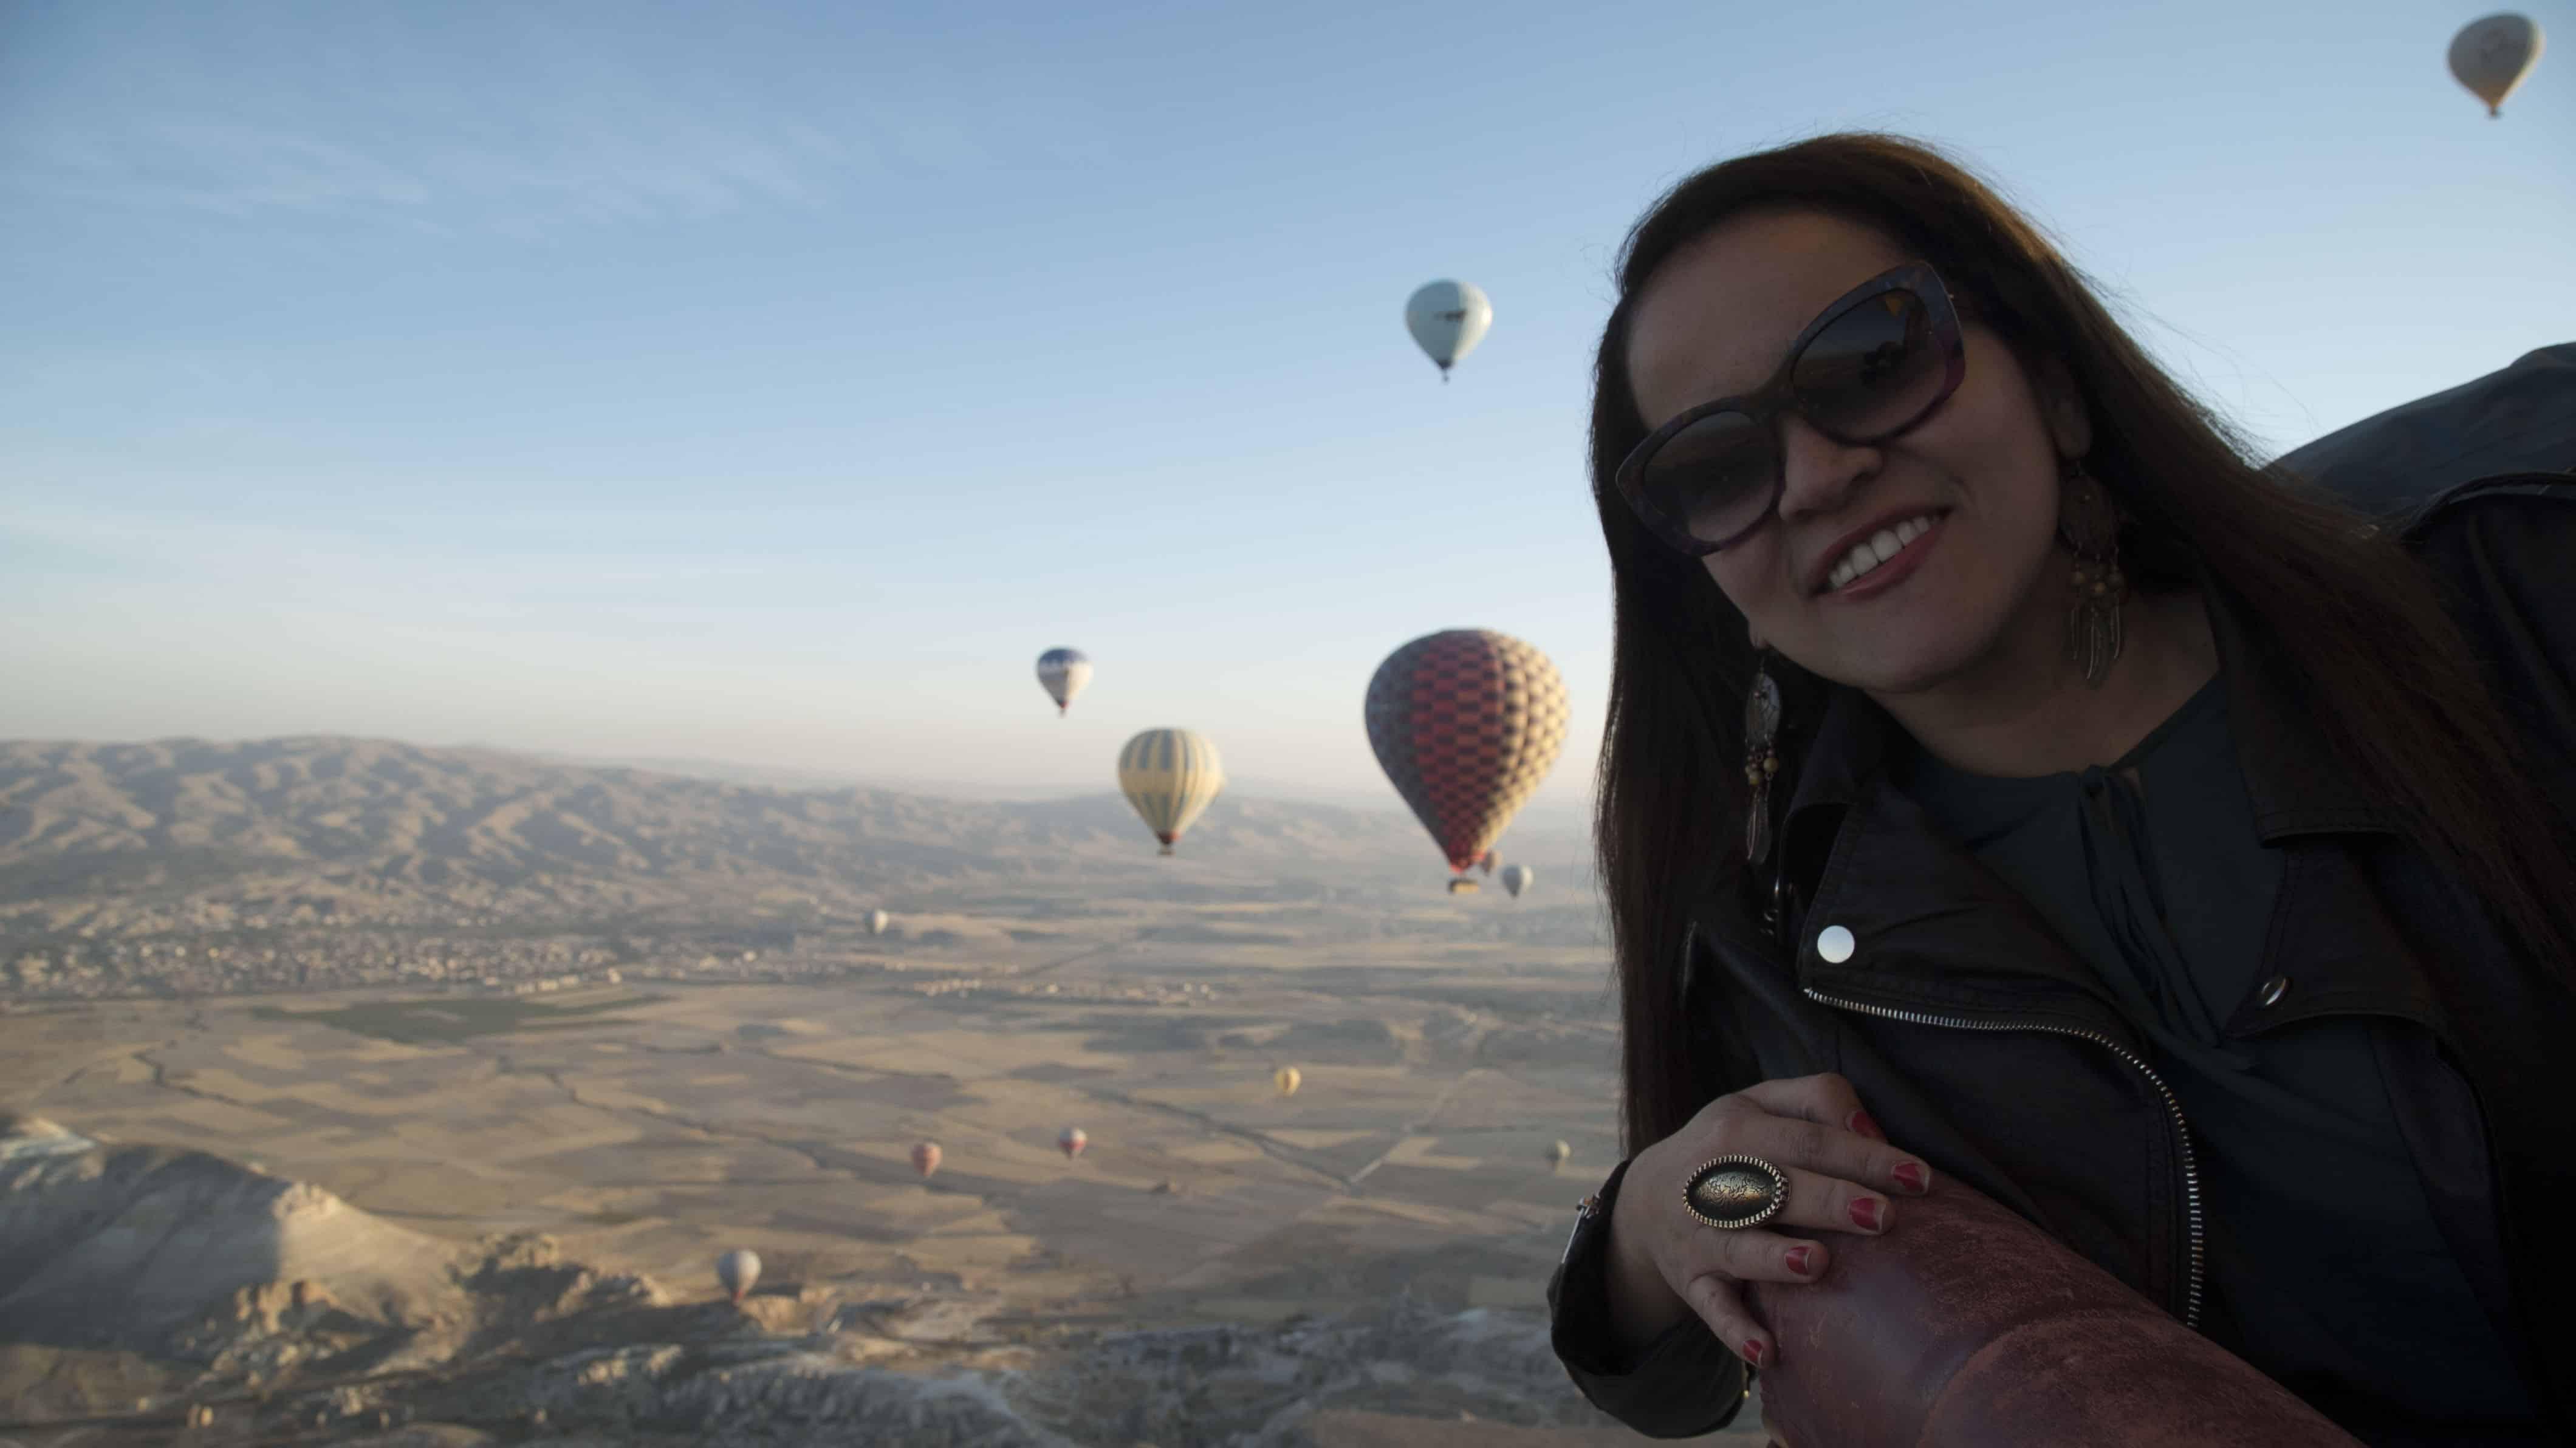 Hot Air Balloon Ride in Cappadocia Turkey